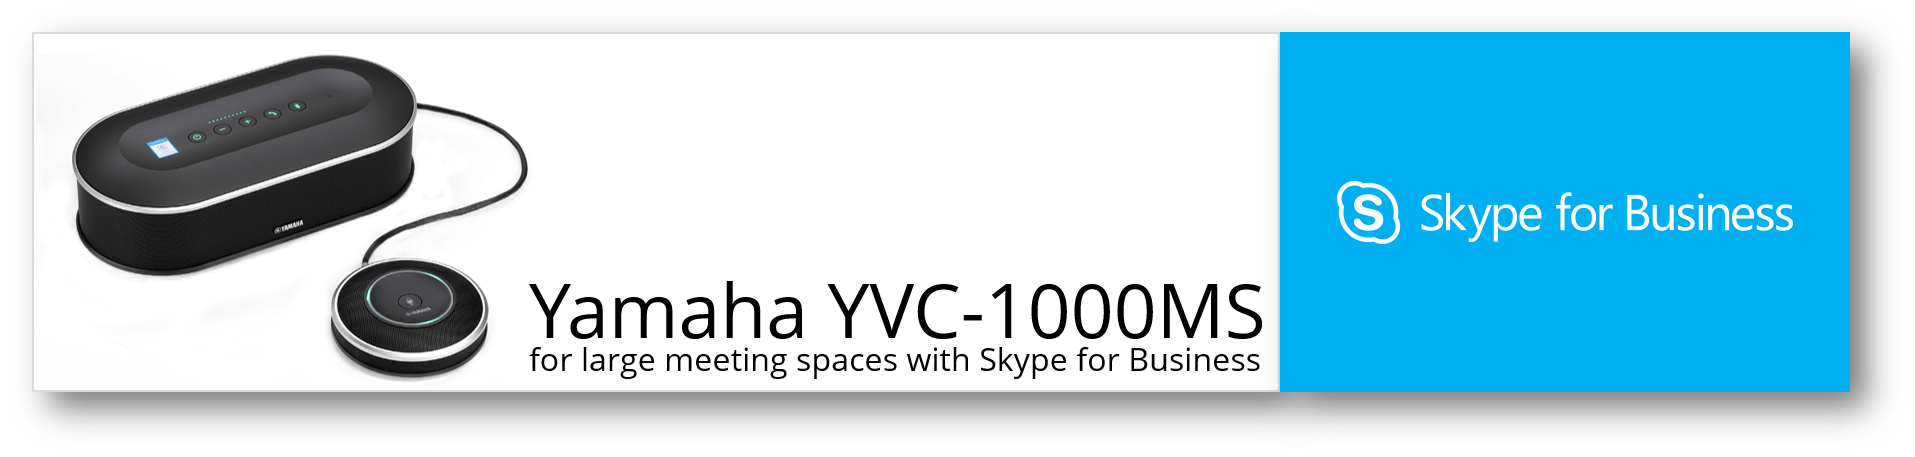 Yamaha YVC 1000MS